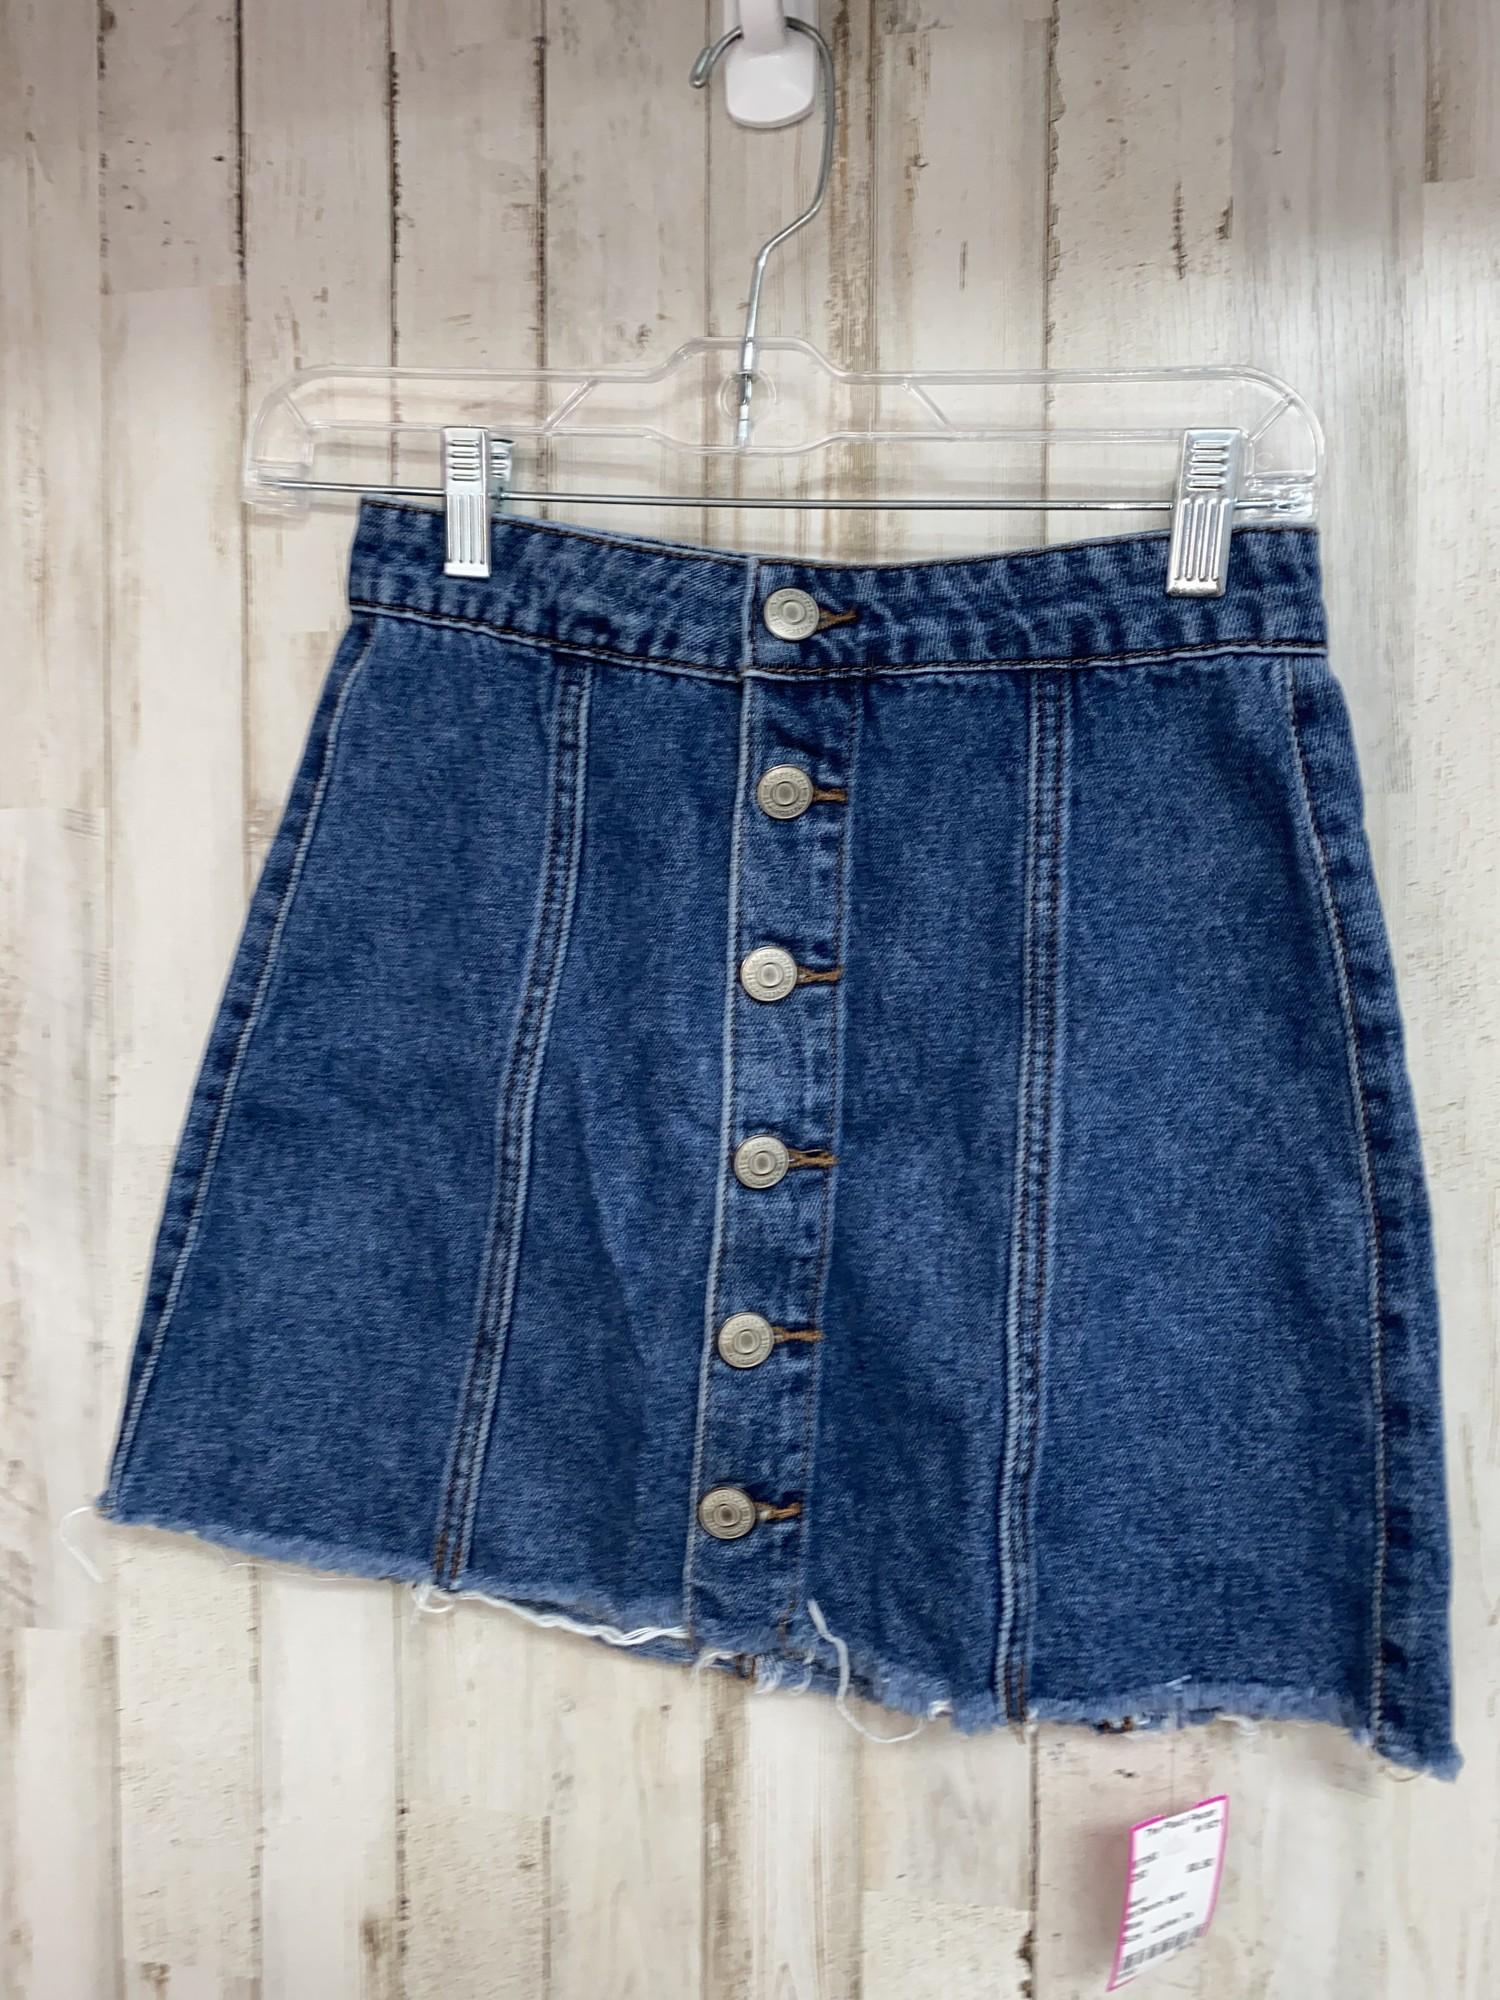 00 Denim Skirt, Blue, Size: Ladies Xs